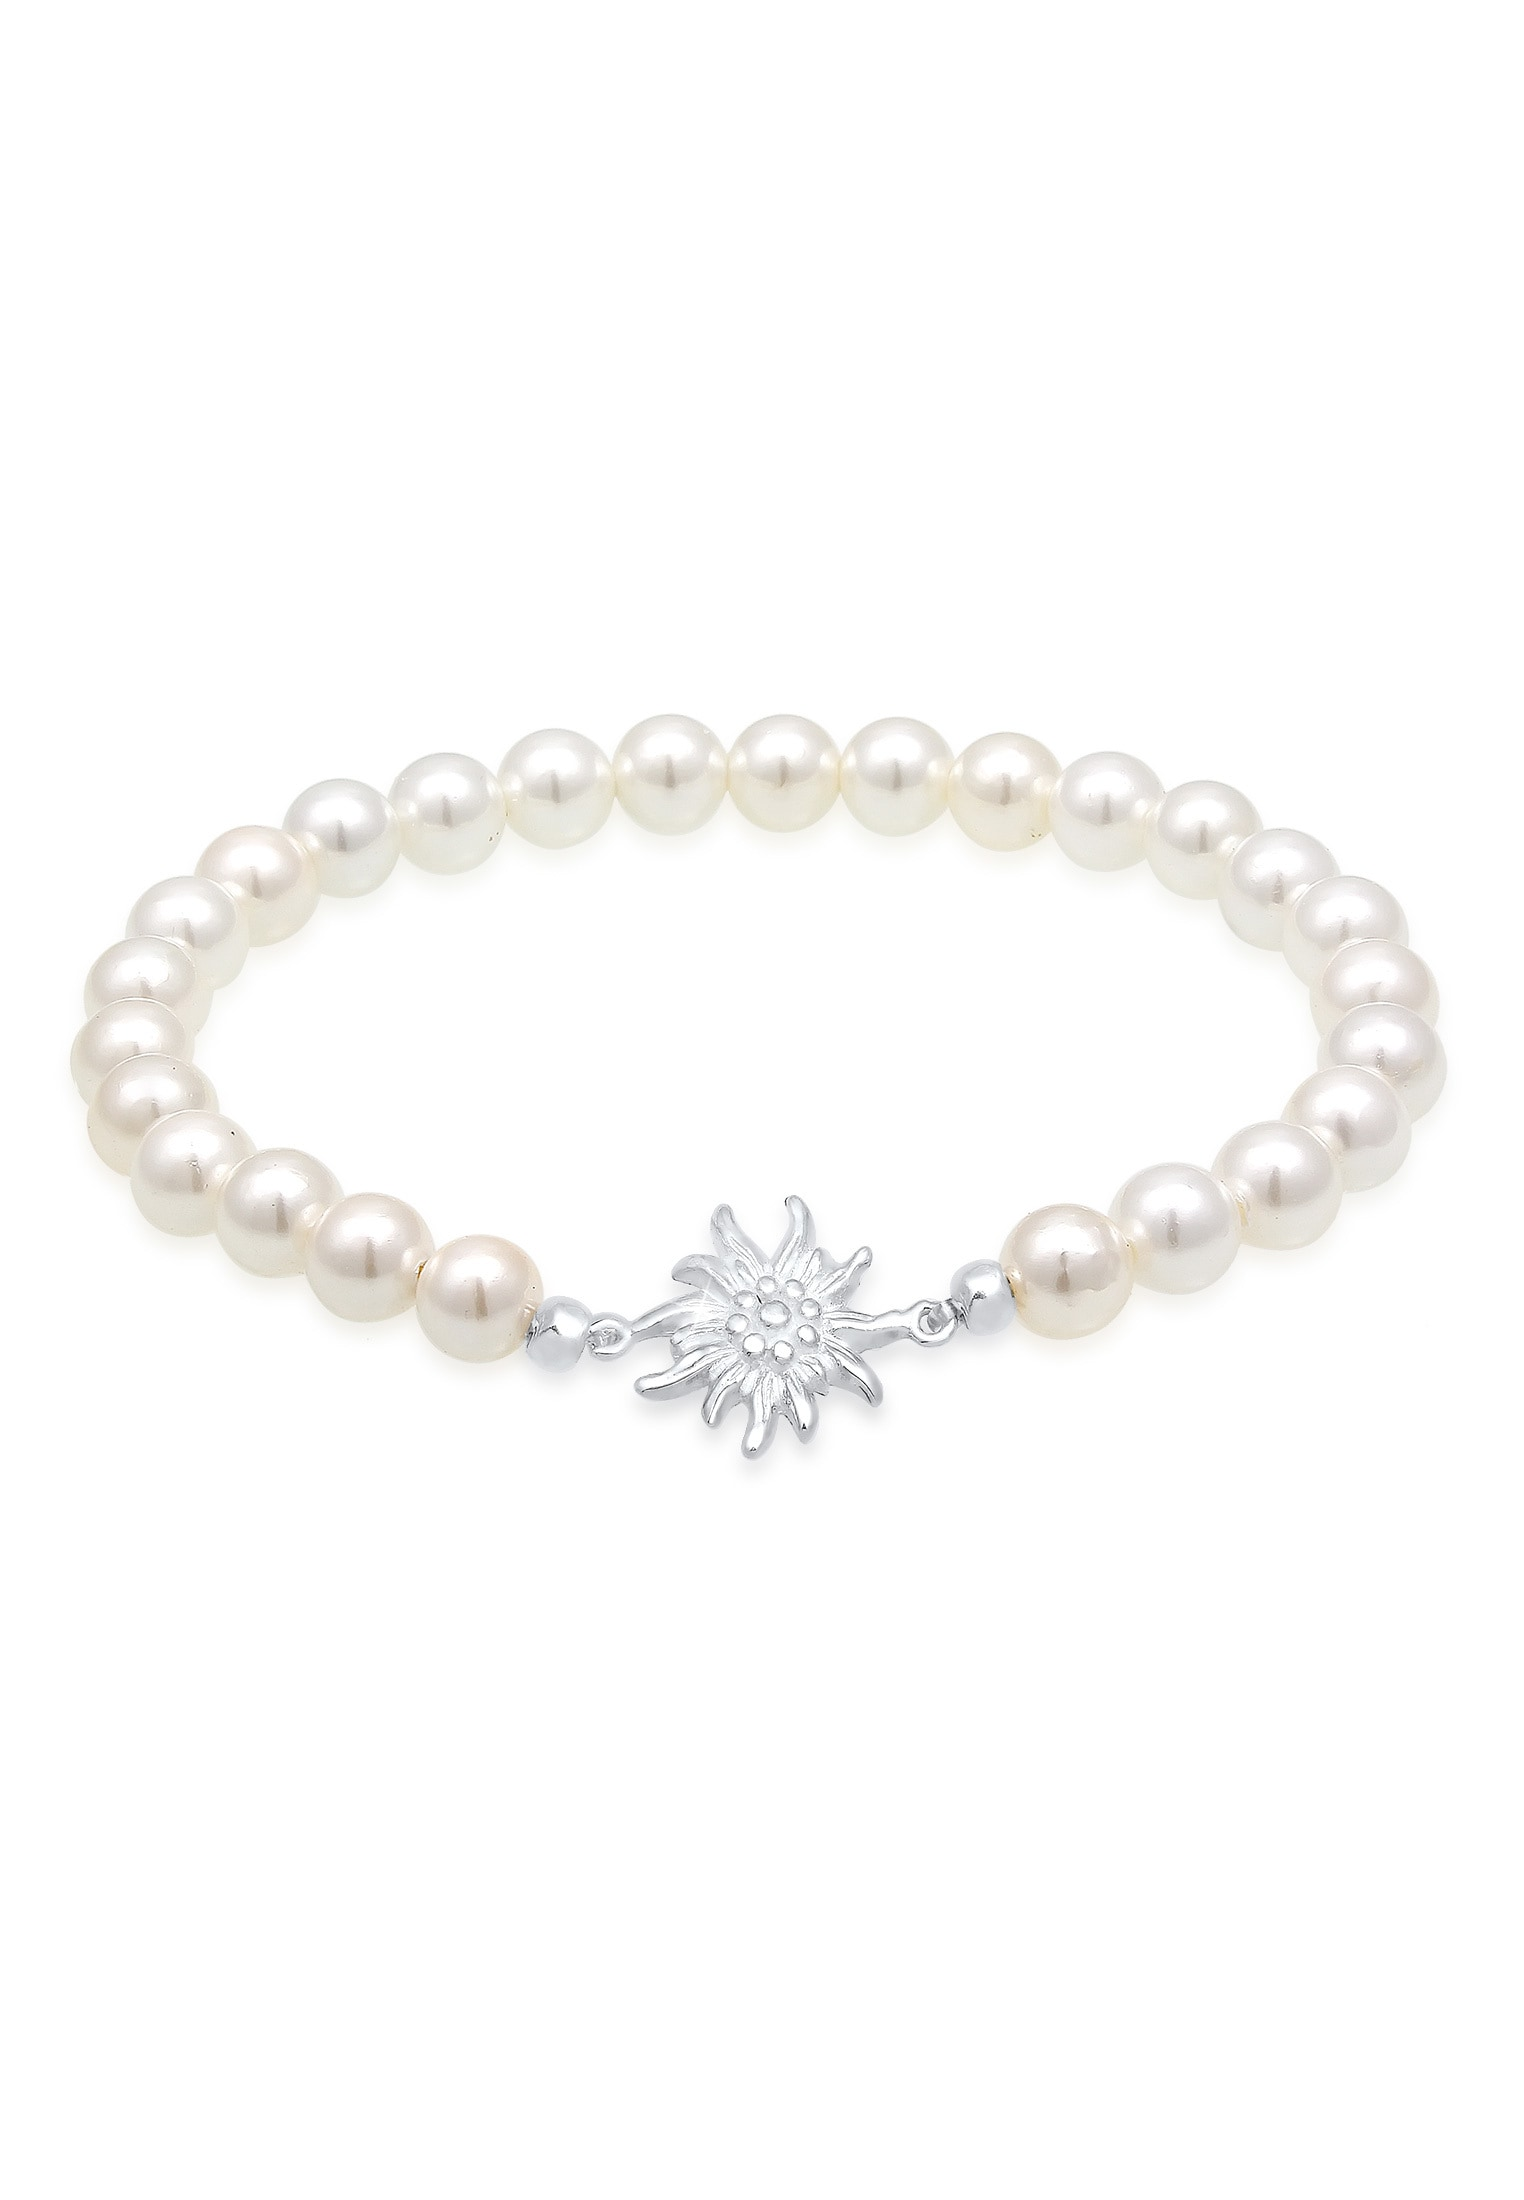 Elli Perlenarmband Edelweiß Perlen Oktoberfest Trachten 925 Silber | Schmuck > Armbänder > Perlenarmbänder | Elli